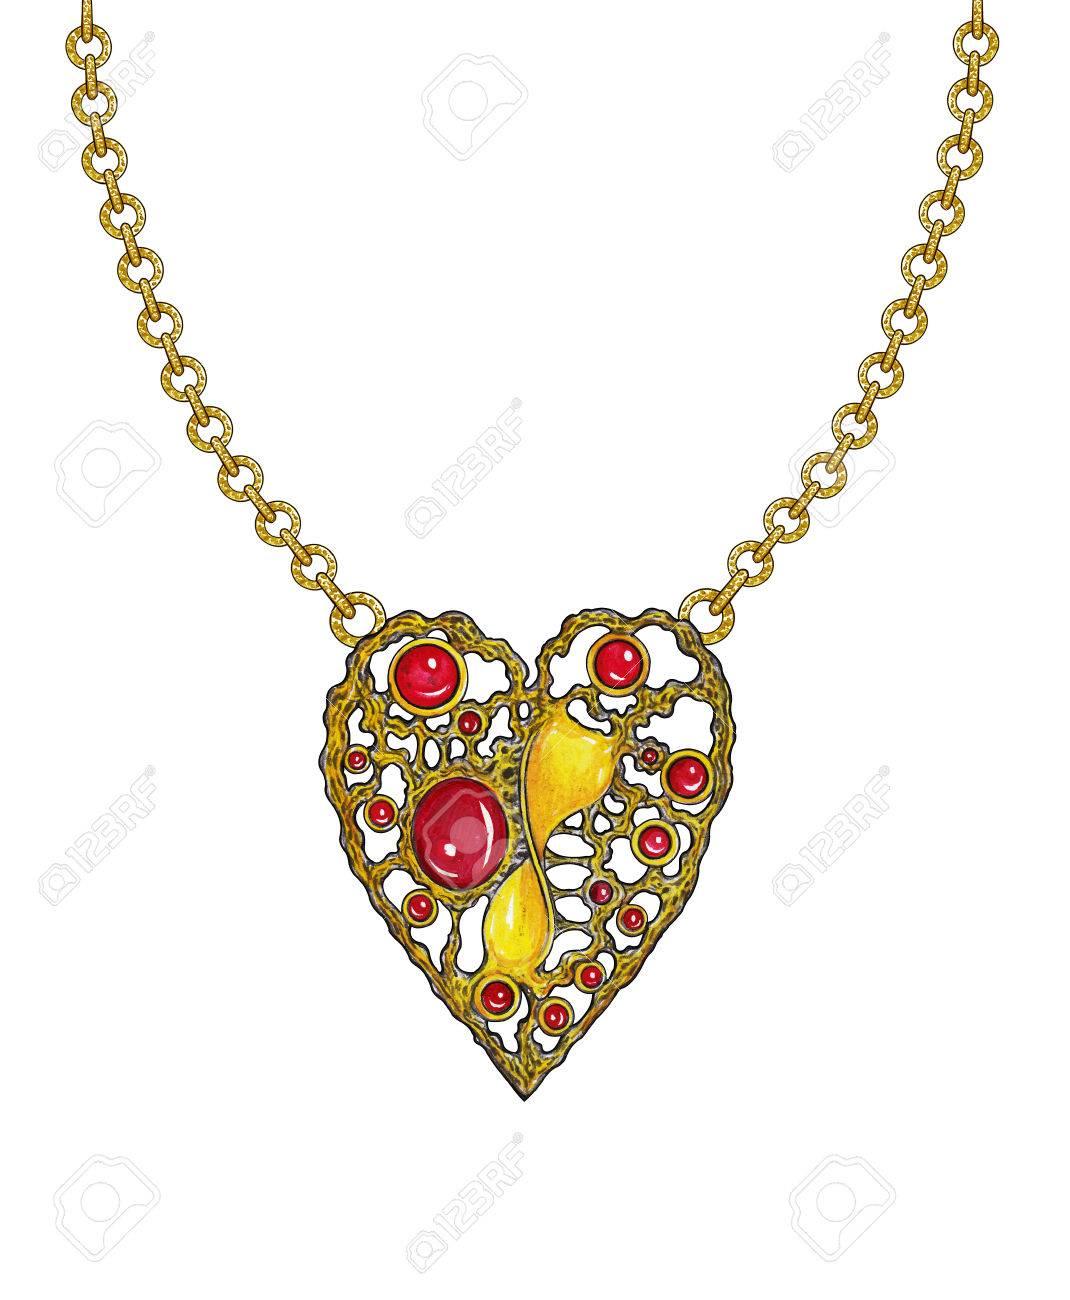 Jewelry design heart art pendanthand drawing and painting on jewelry design heart art pendanthand drawing and painting on paper mozeypictures Choice Image